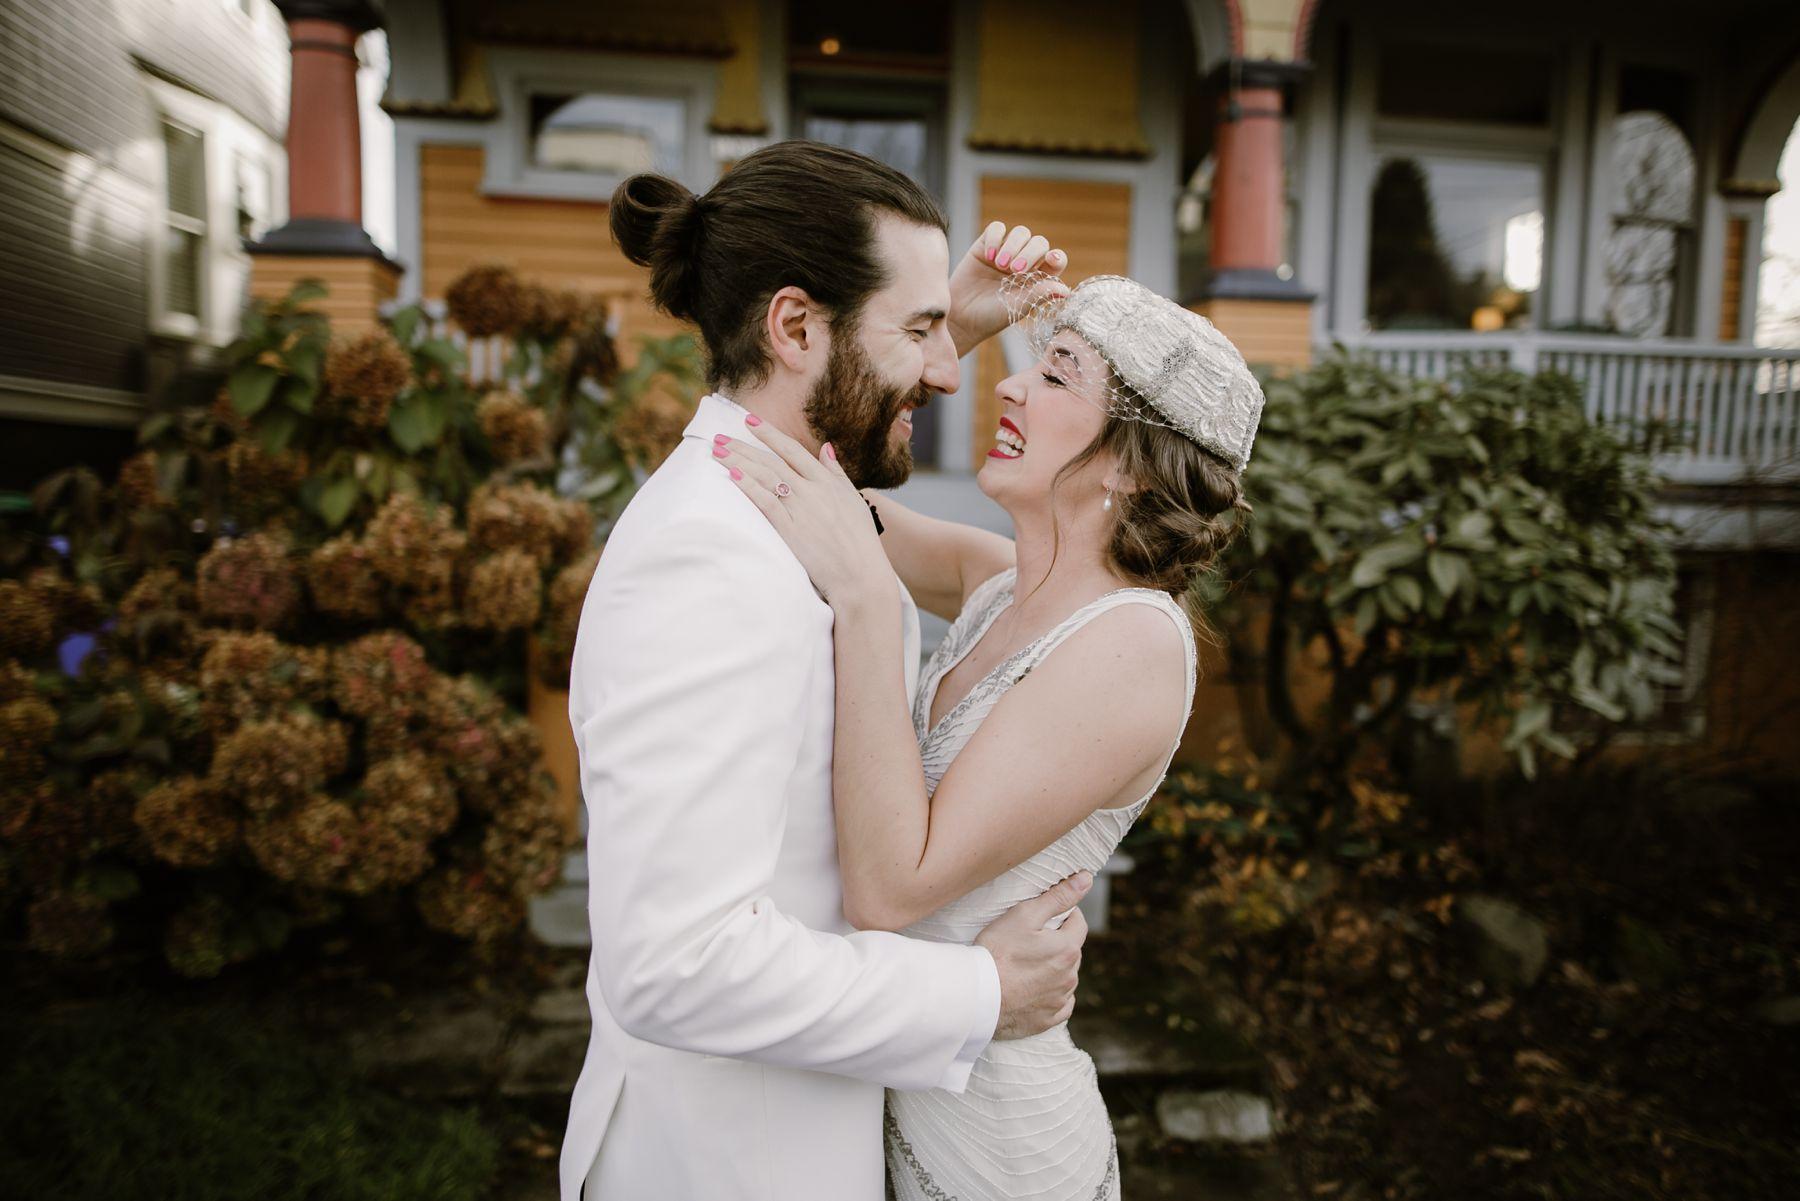 union-pine-wedding_0025.jpg